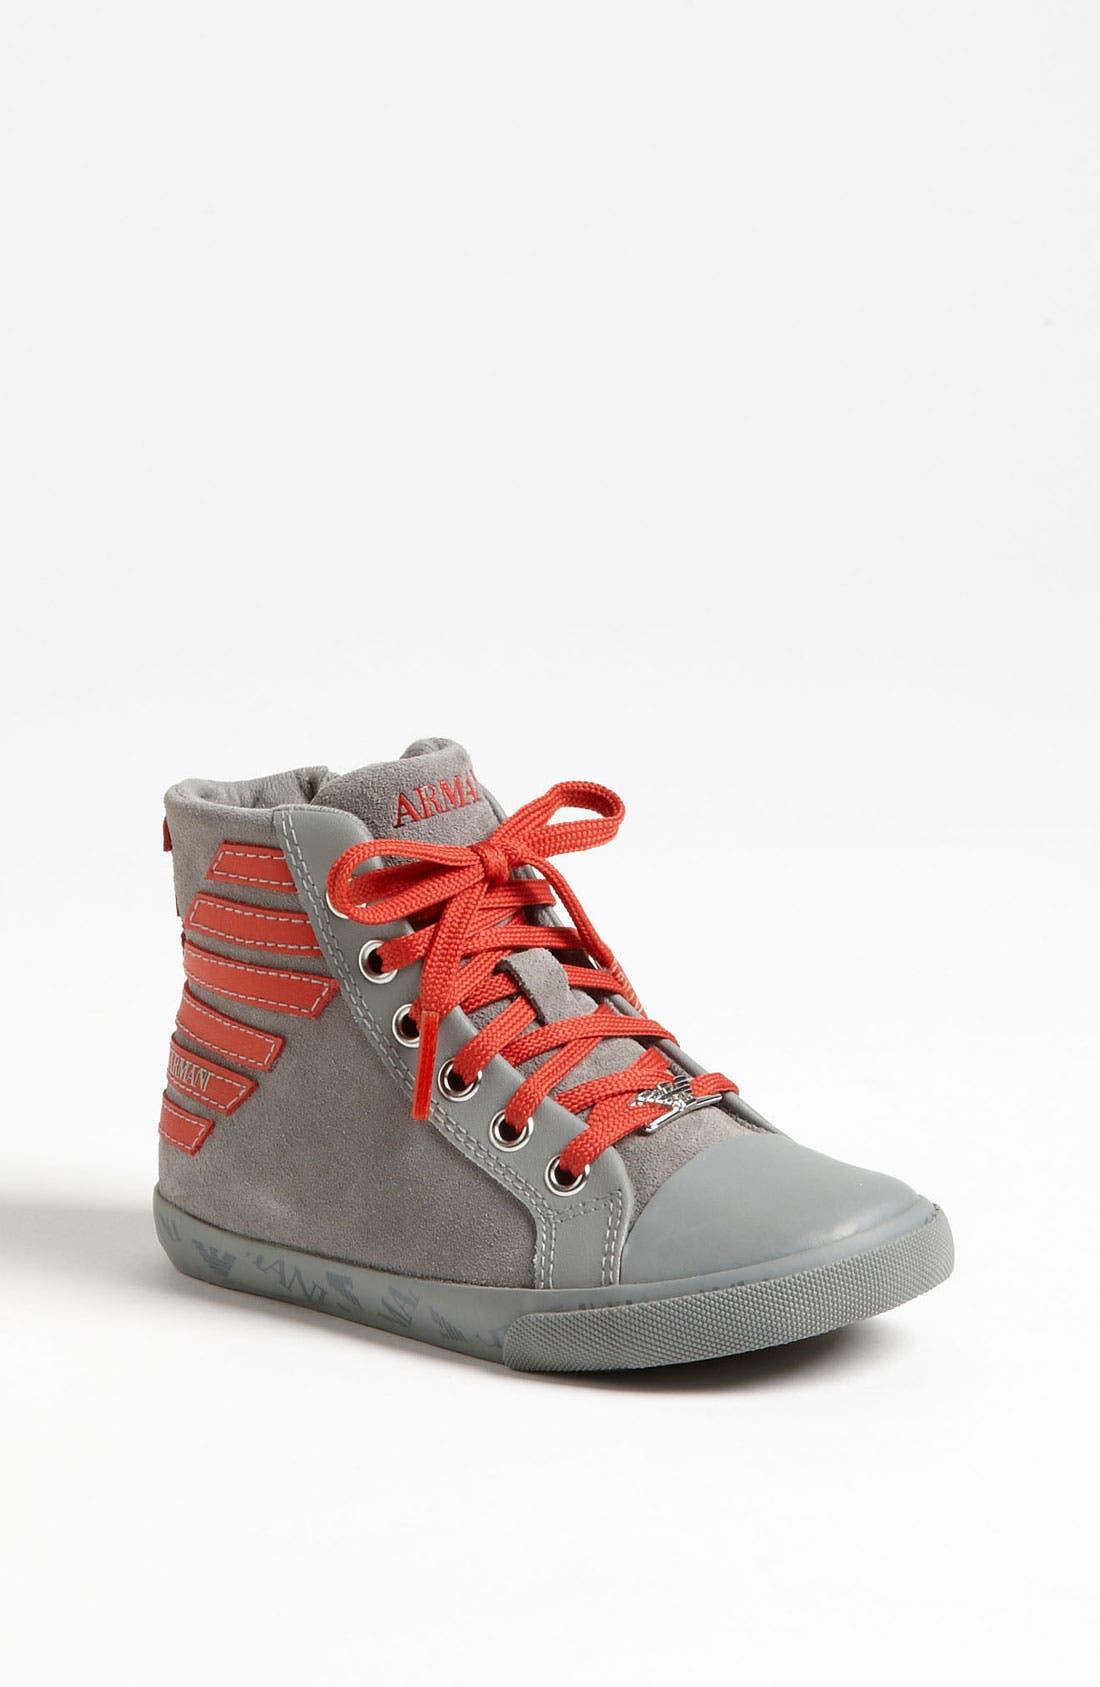 Alternate Image 1 Selected - Armani Junior 'Eagle' Sneaker (Walker & Toddler)